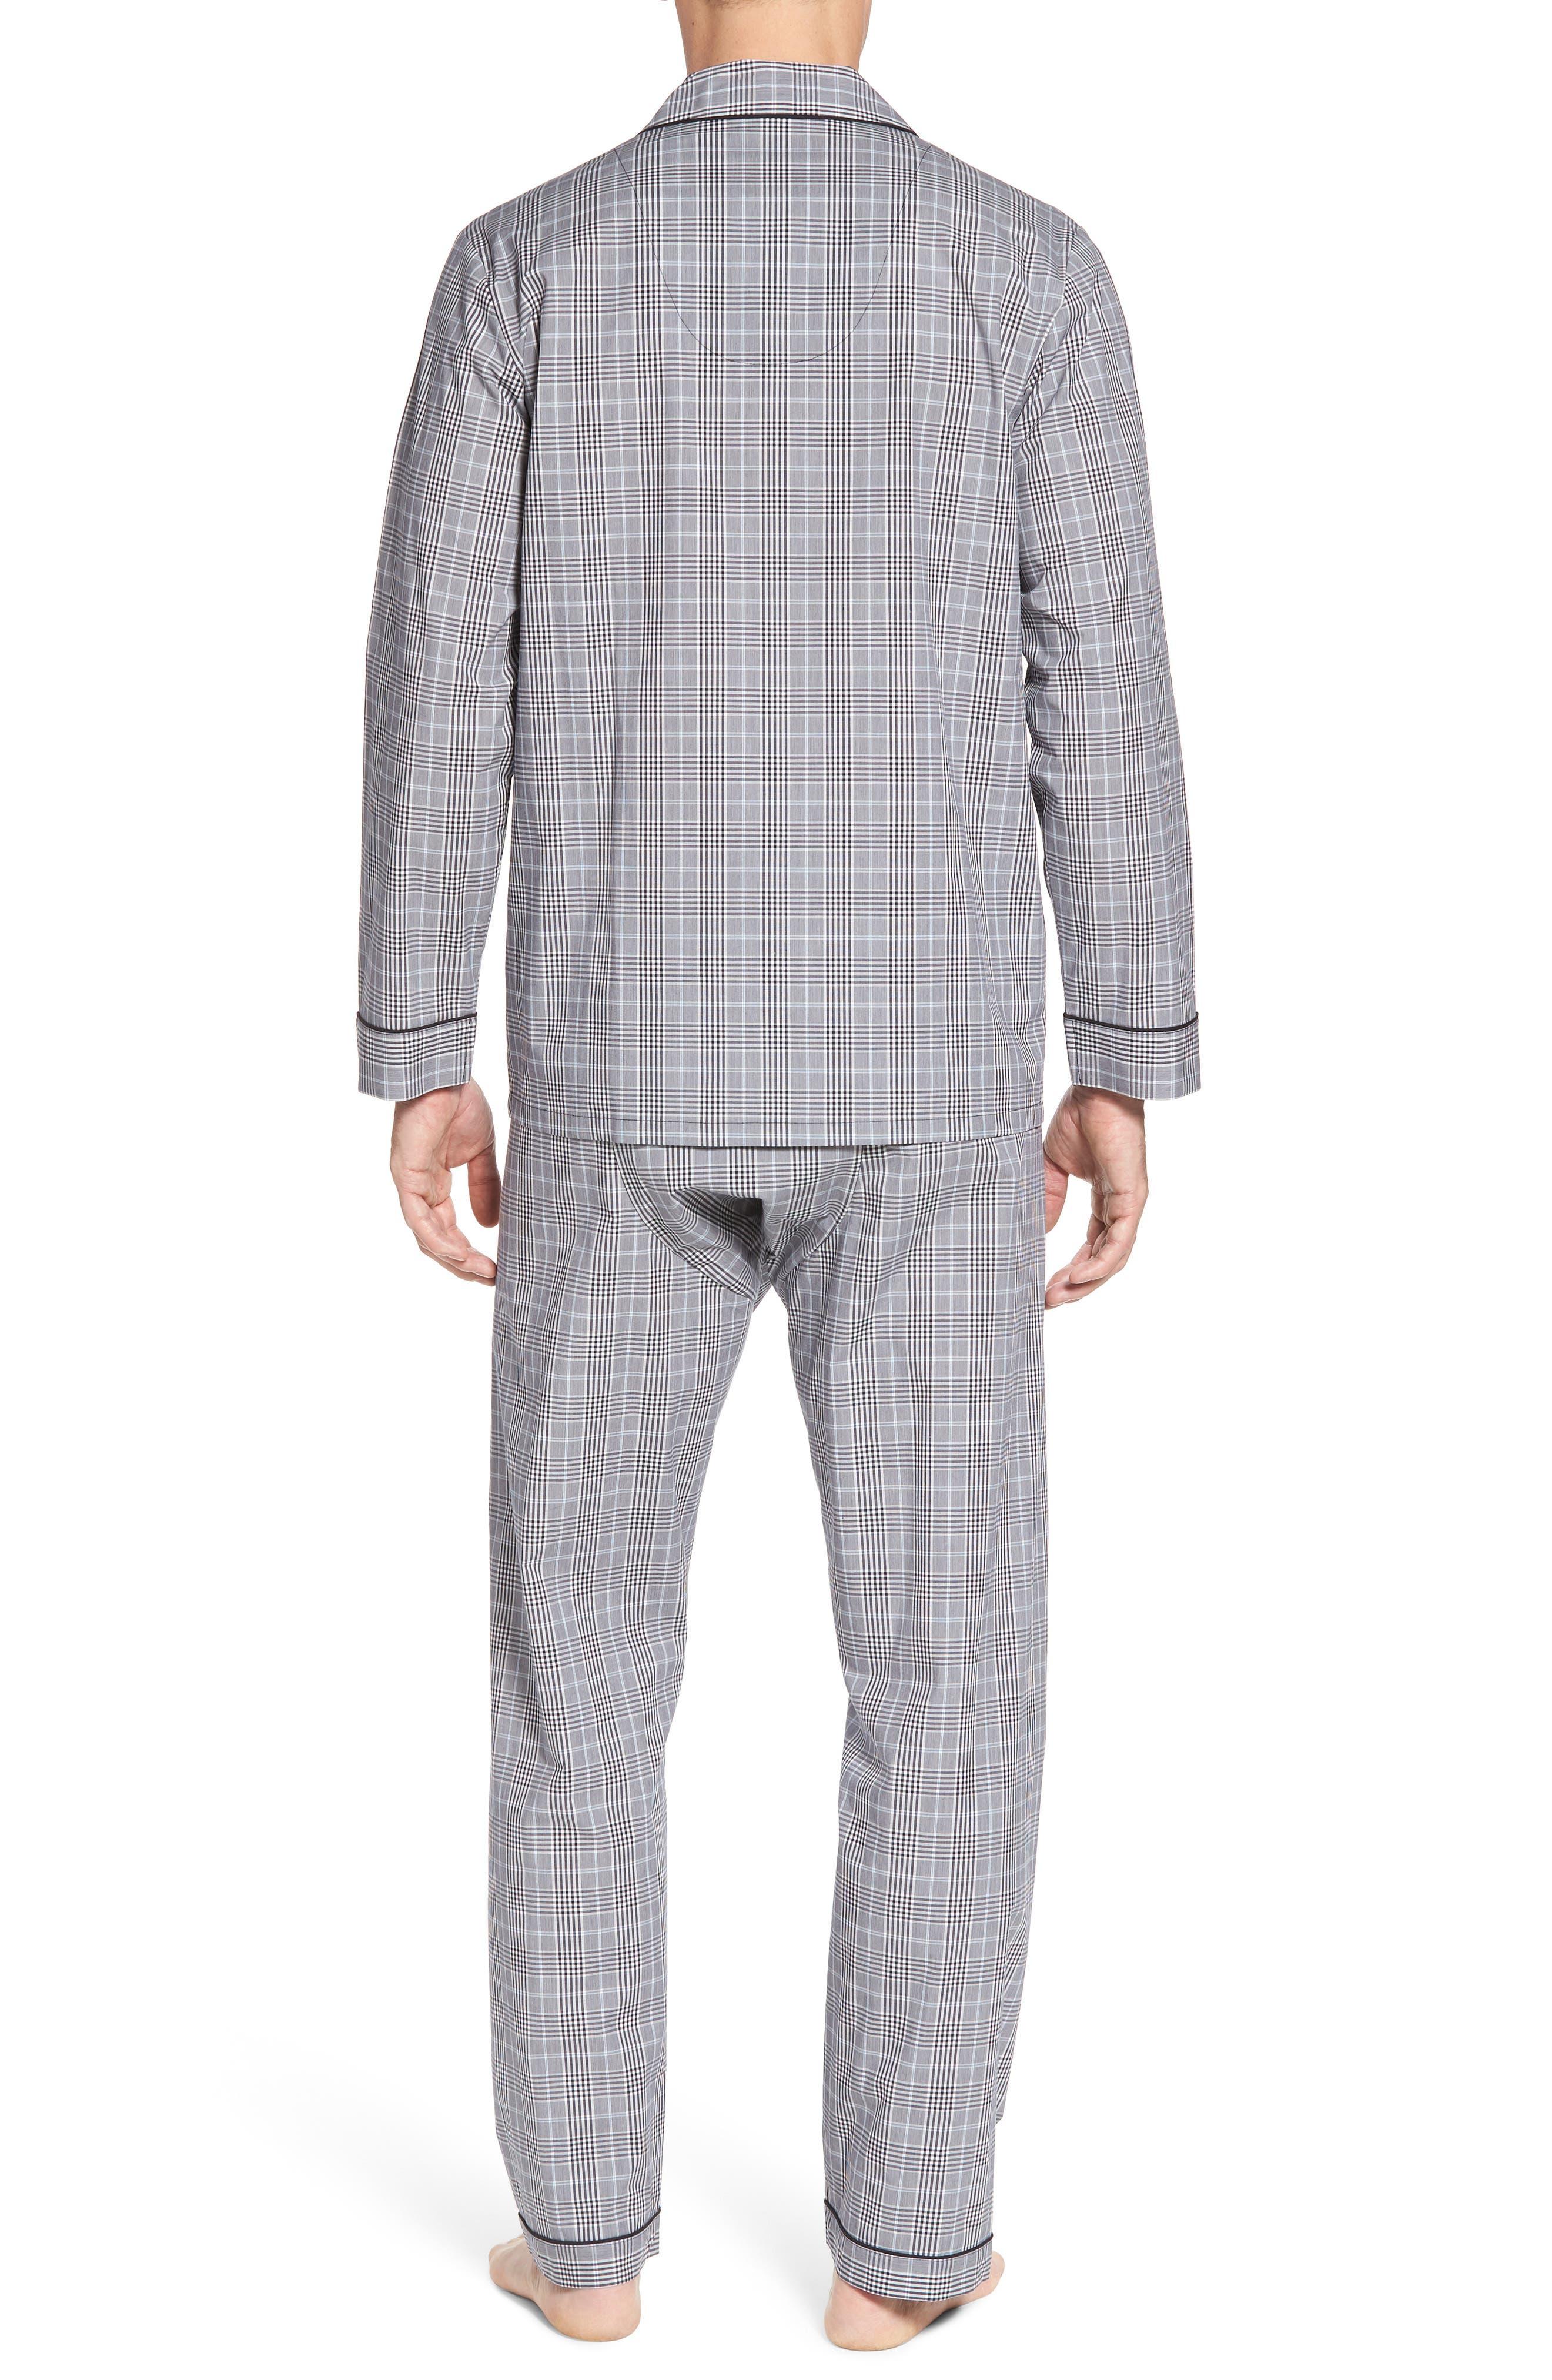 Charleston Pajama Set,                             Alternate thumbnail 2, color,                             Black Plaid